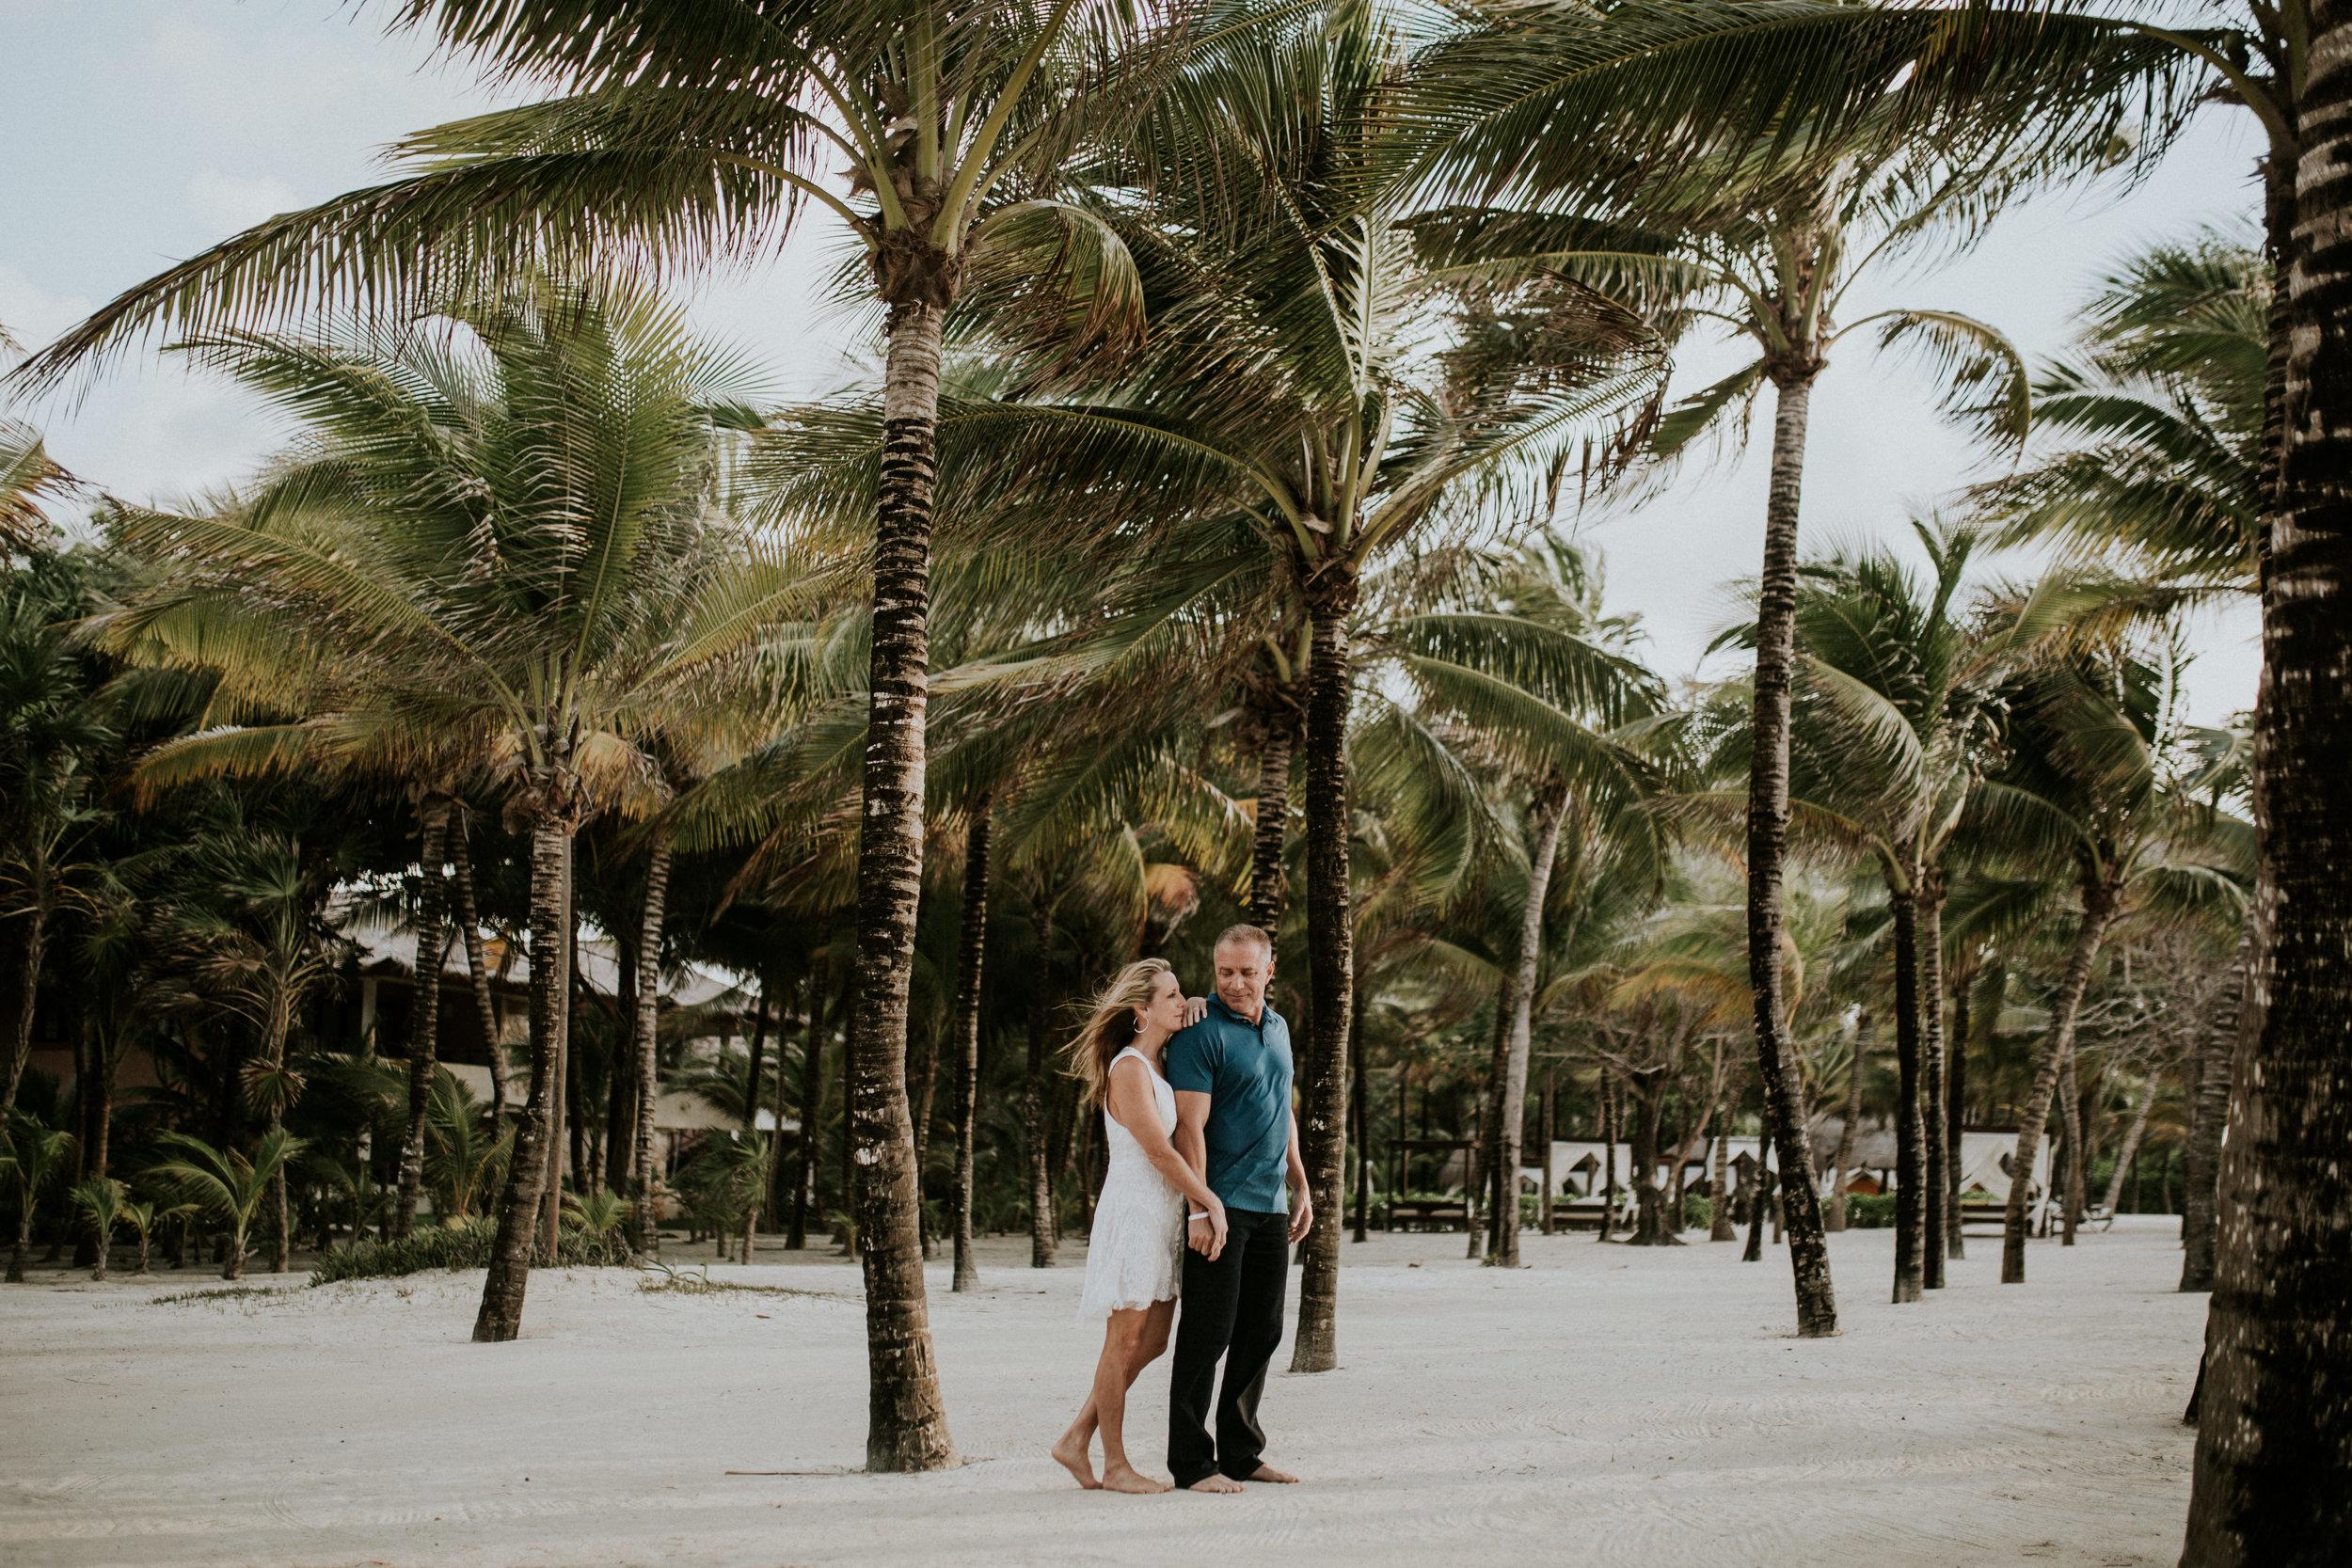 Cancun20199-37.jpg